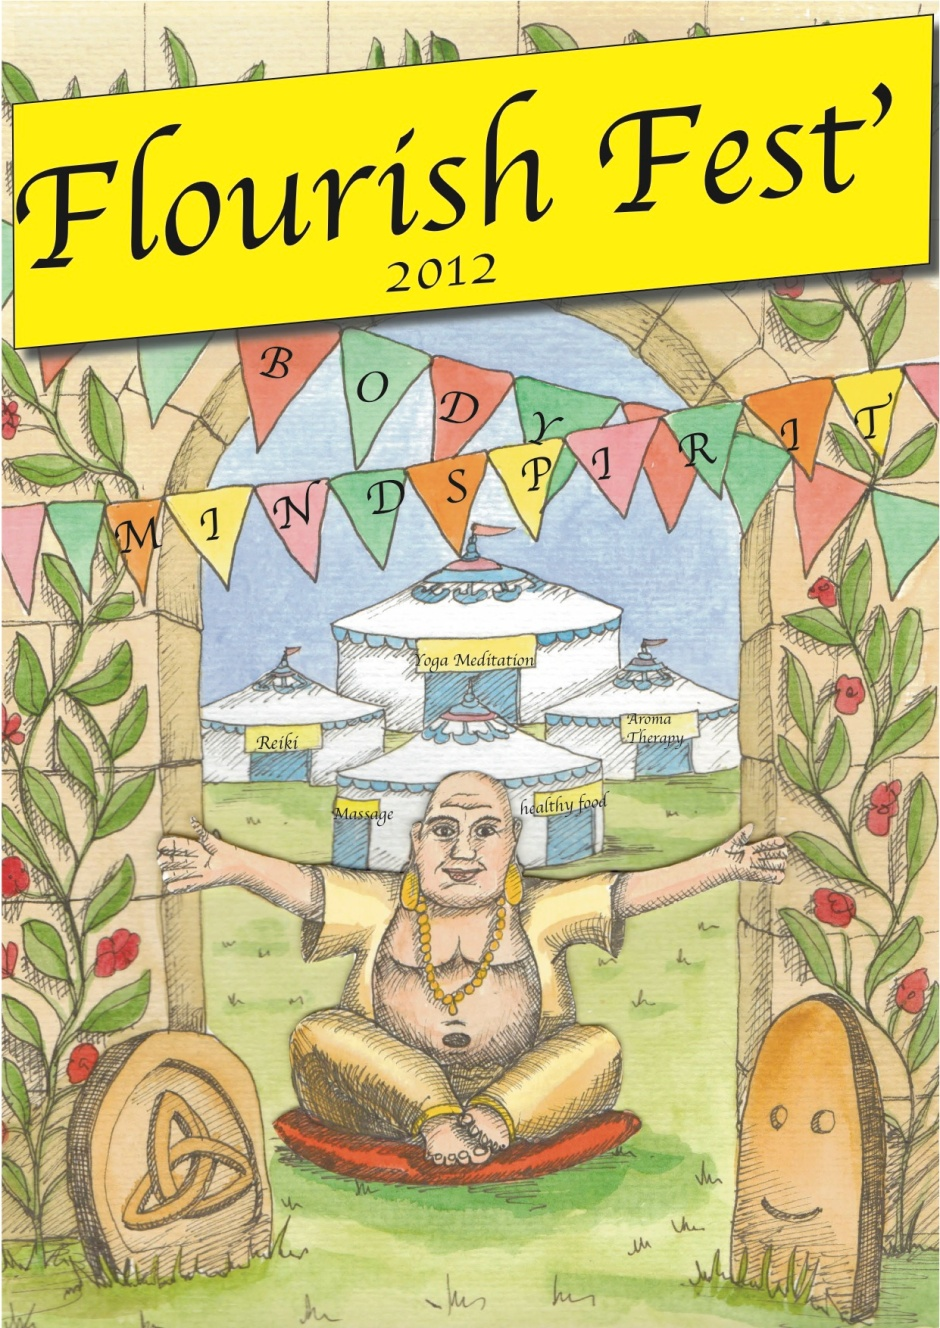 Flourish Fest Poster 2